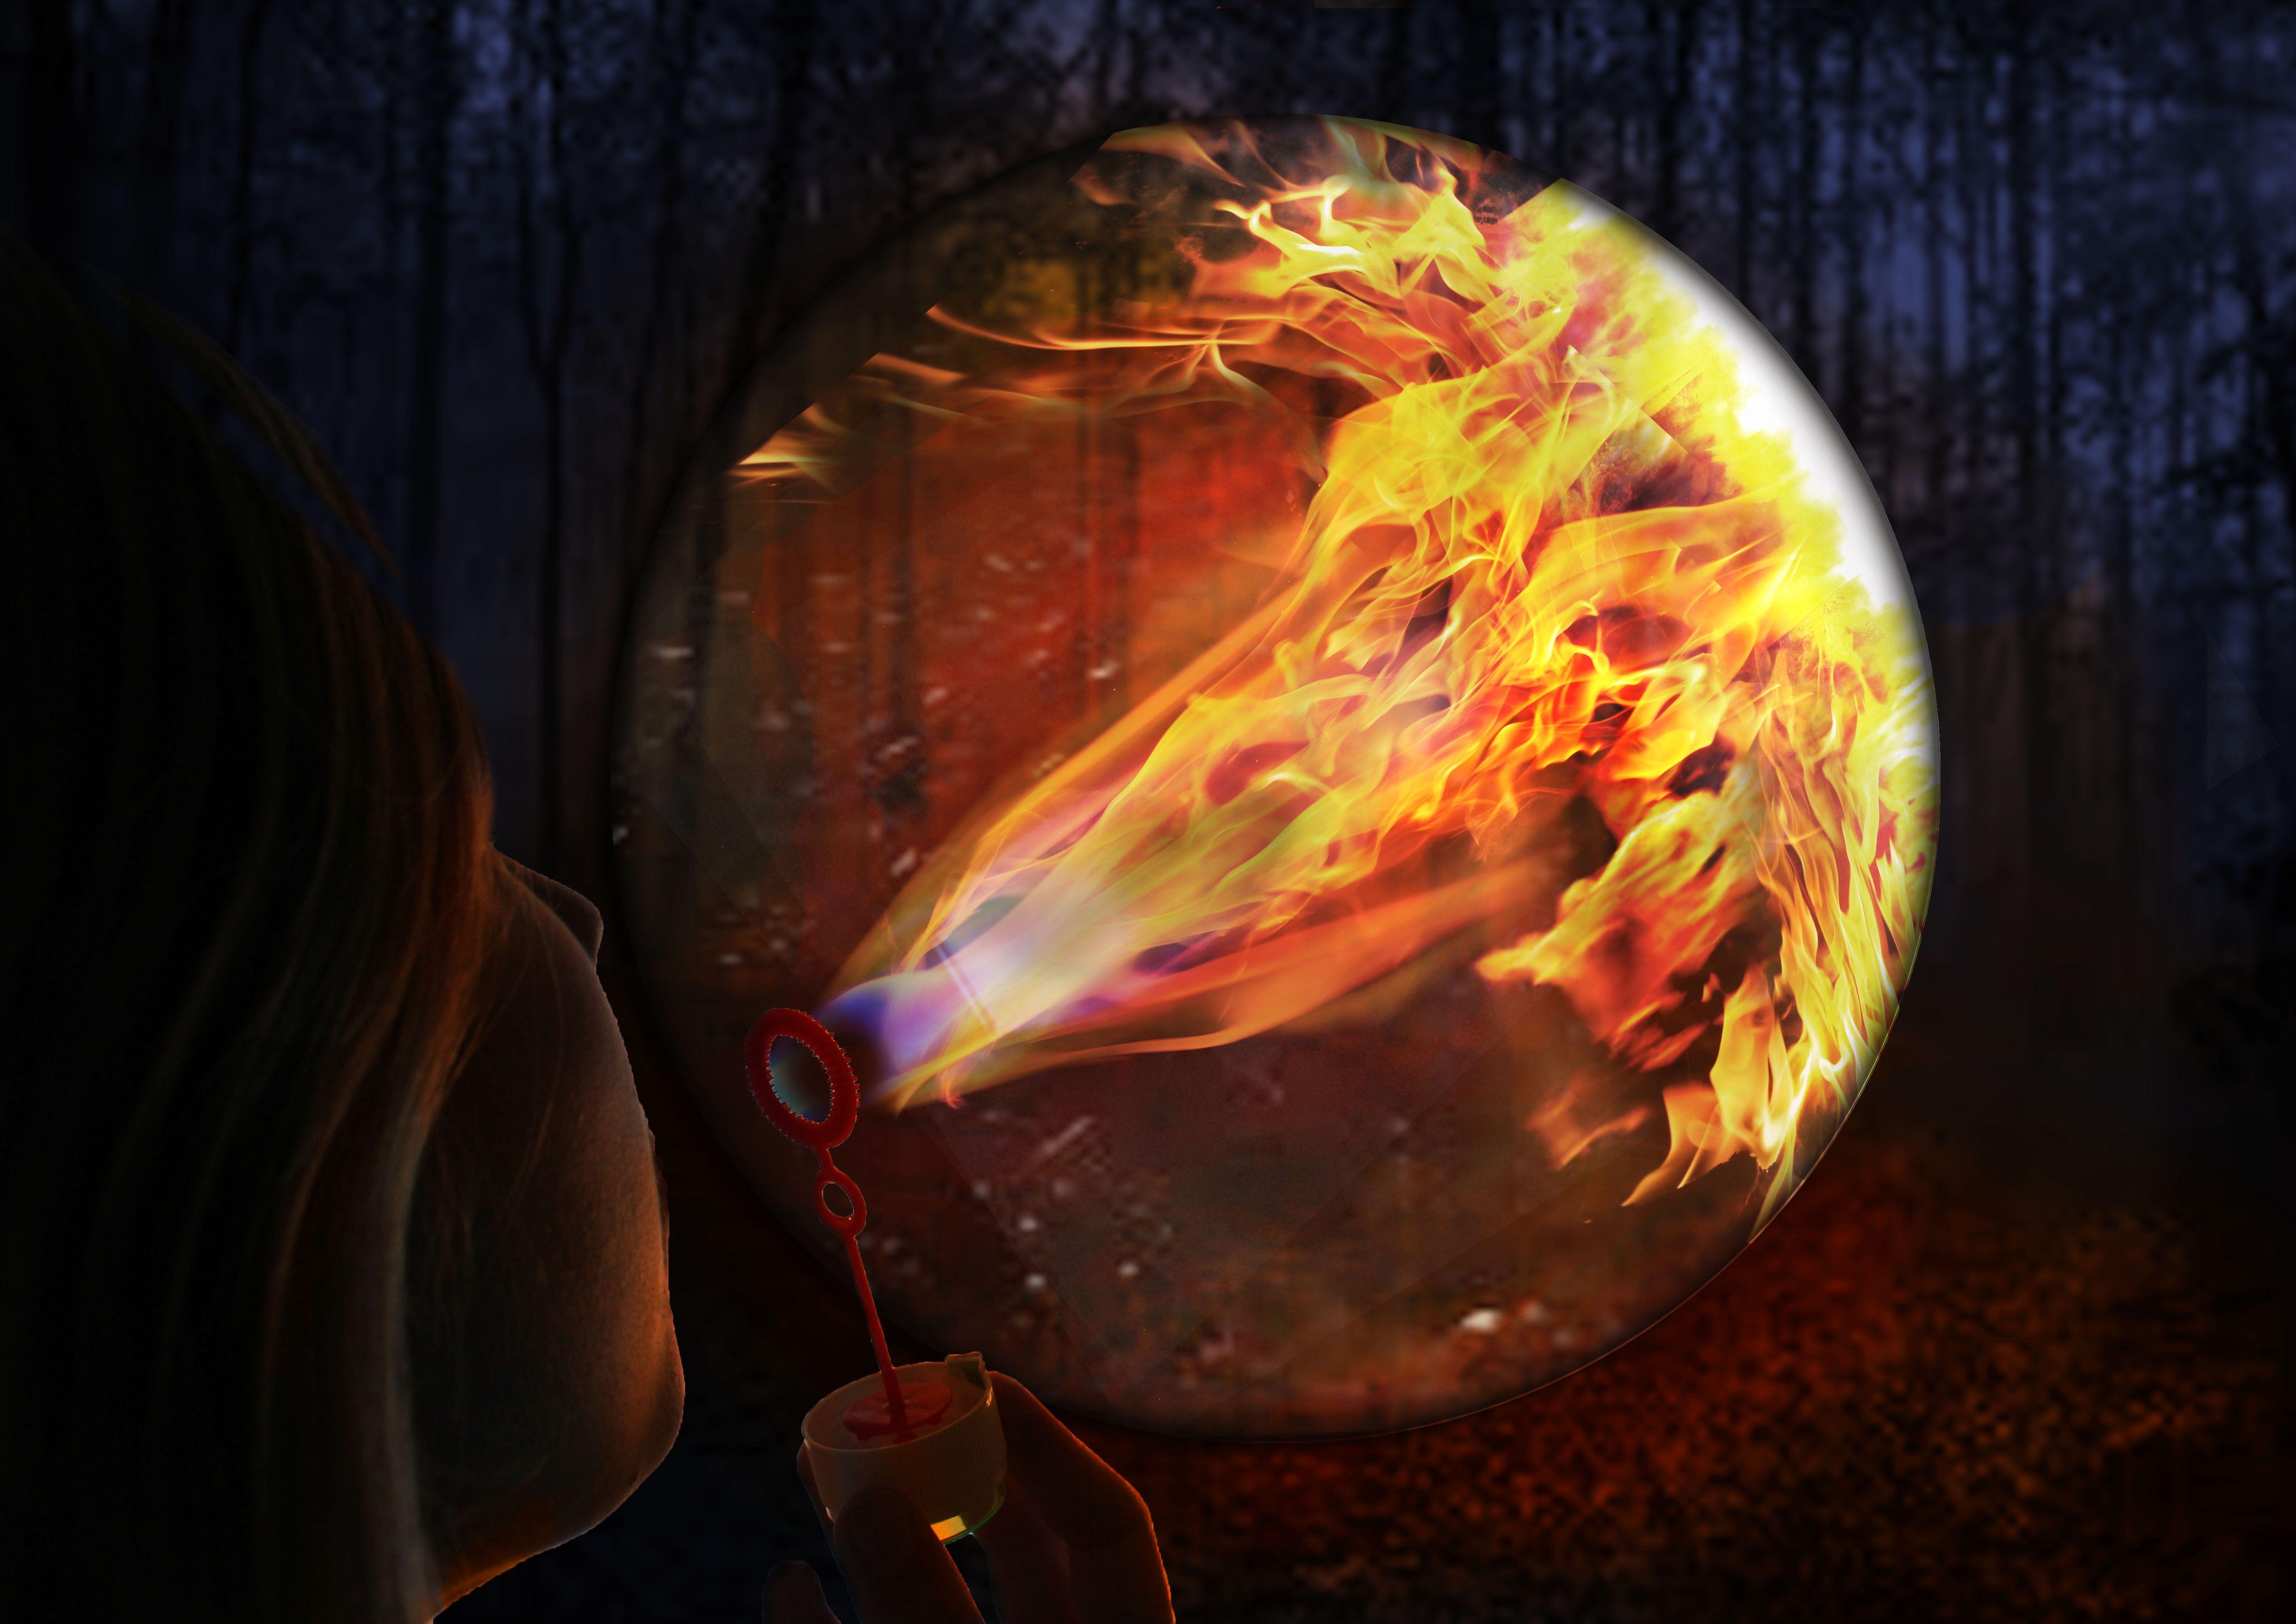 Photos of the fire bubble